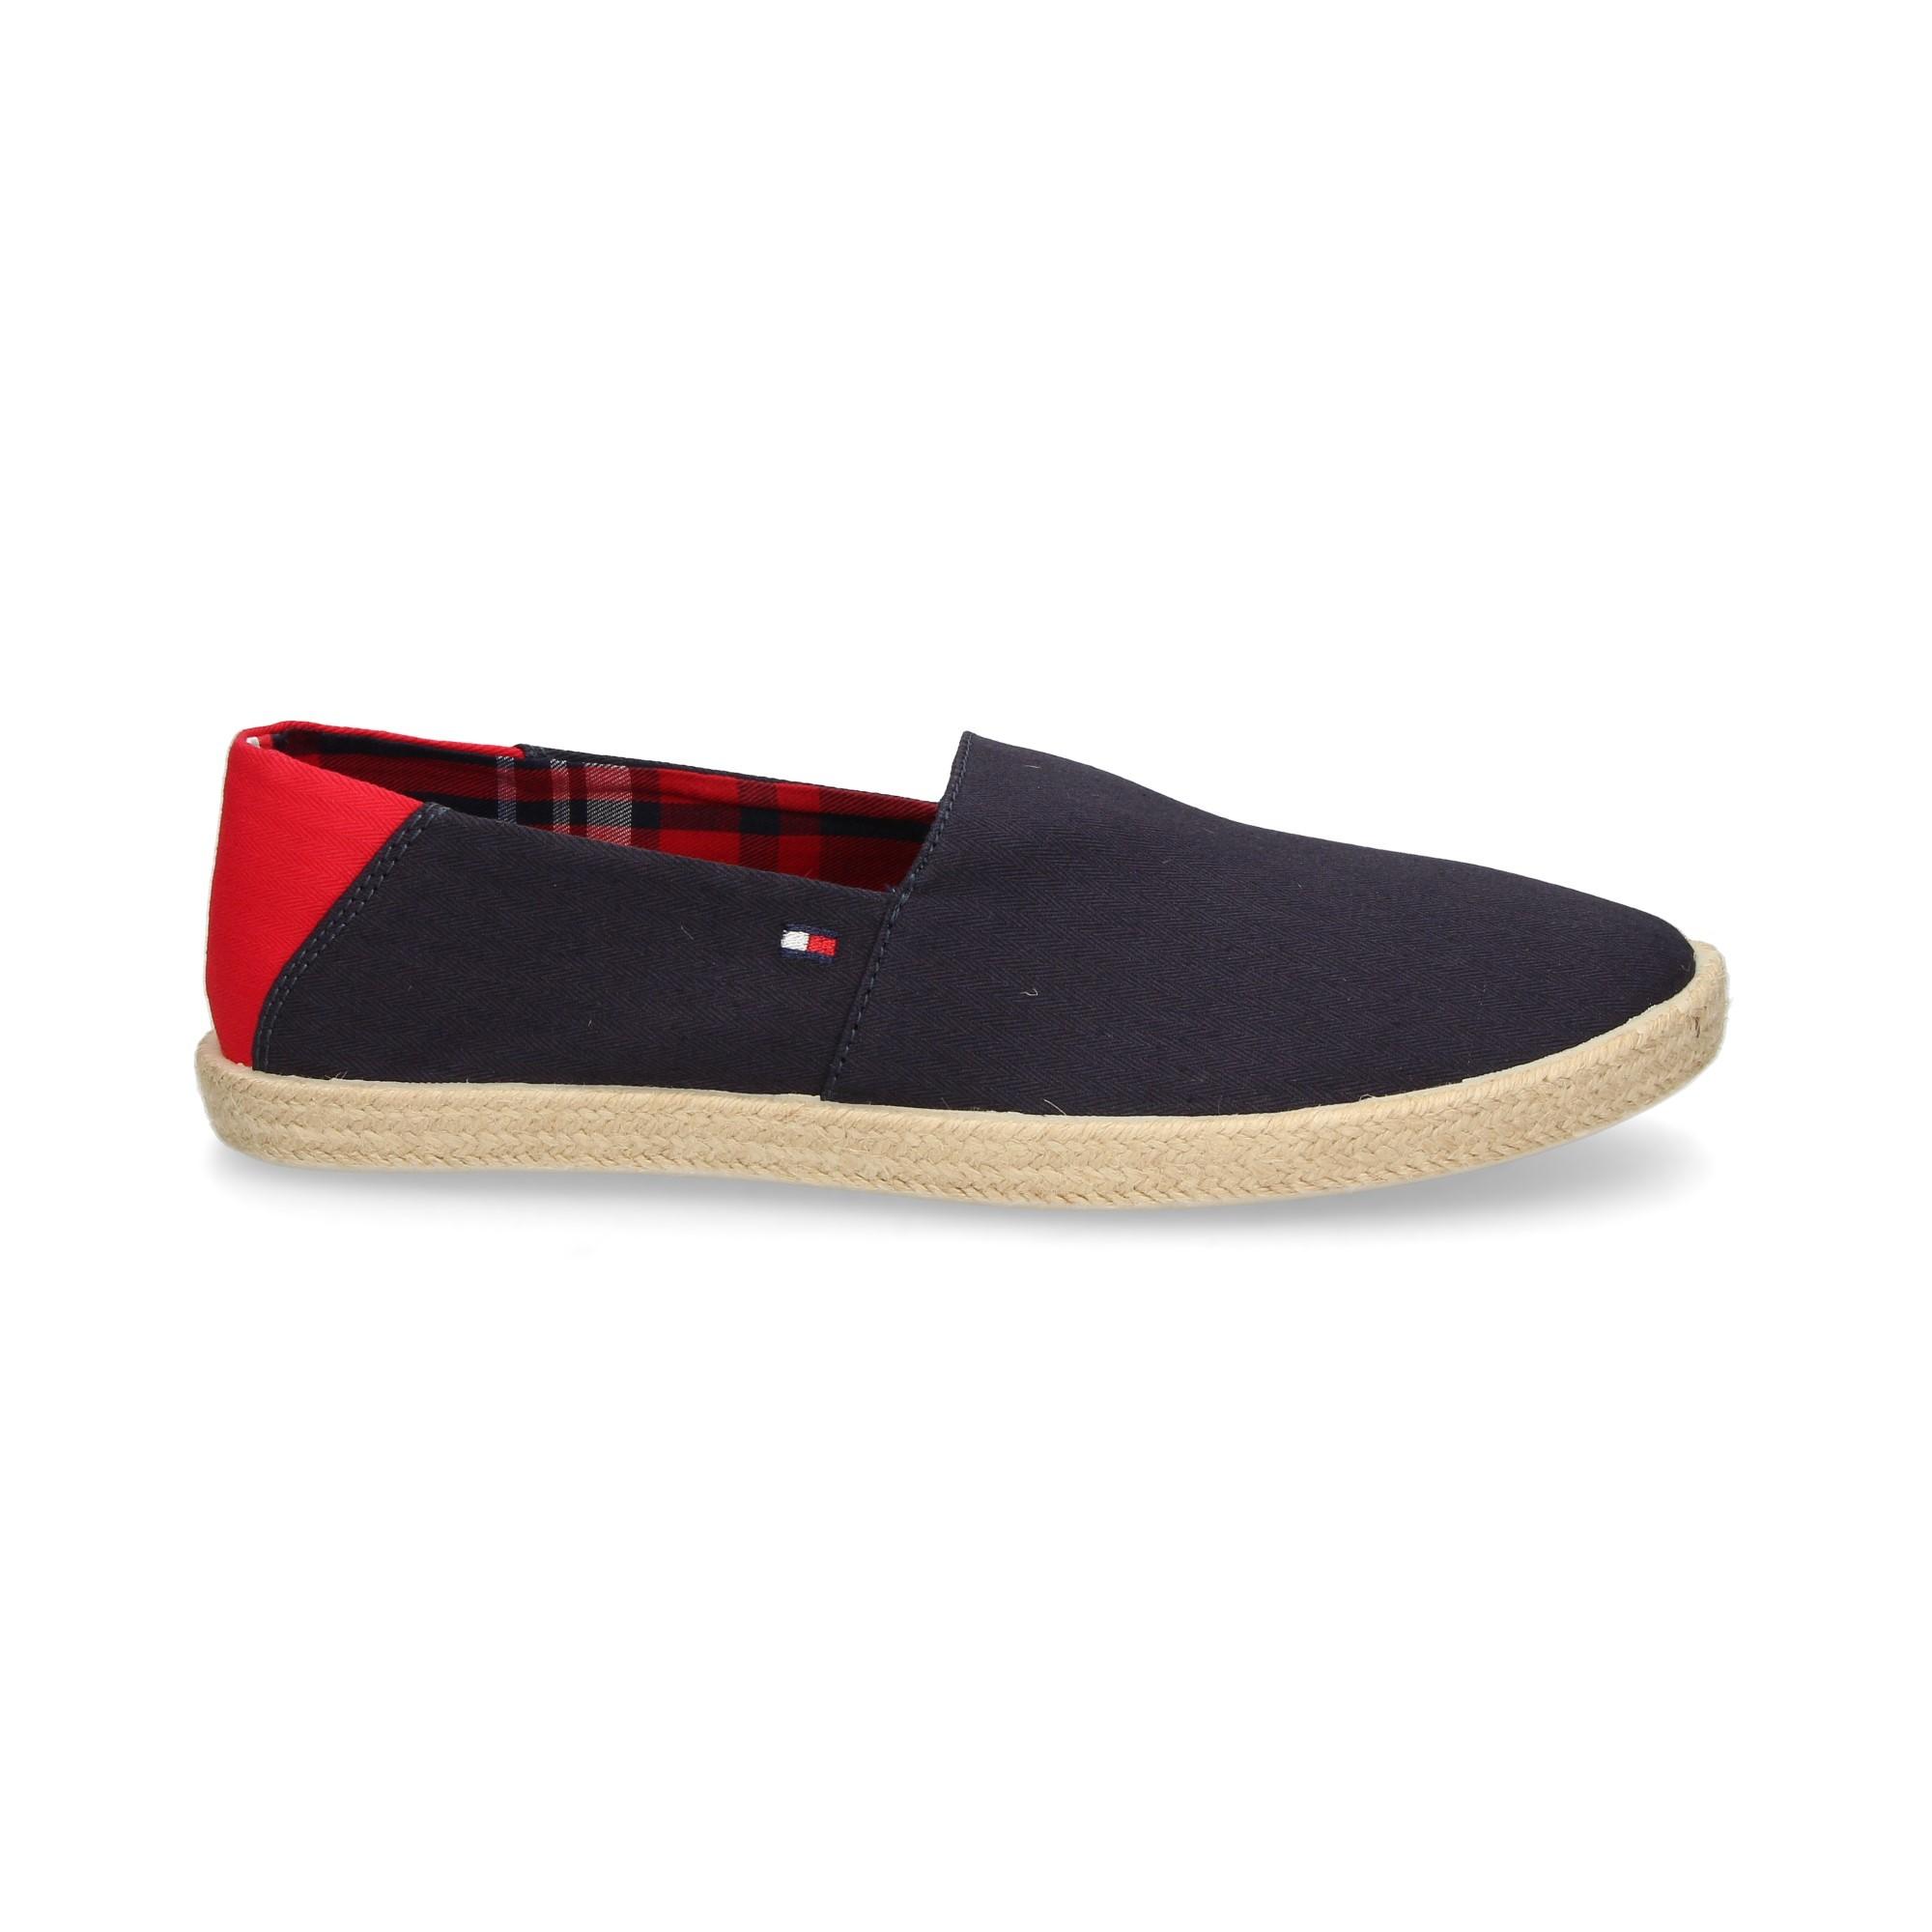 alpargata-textil-azul-rojo